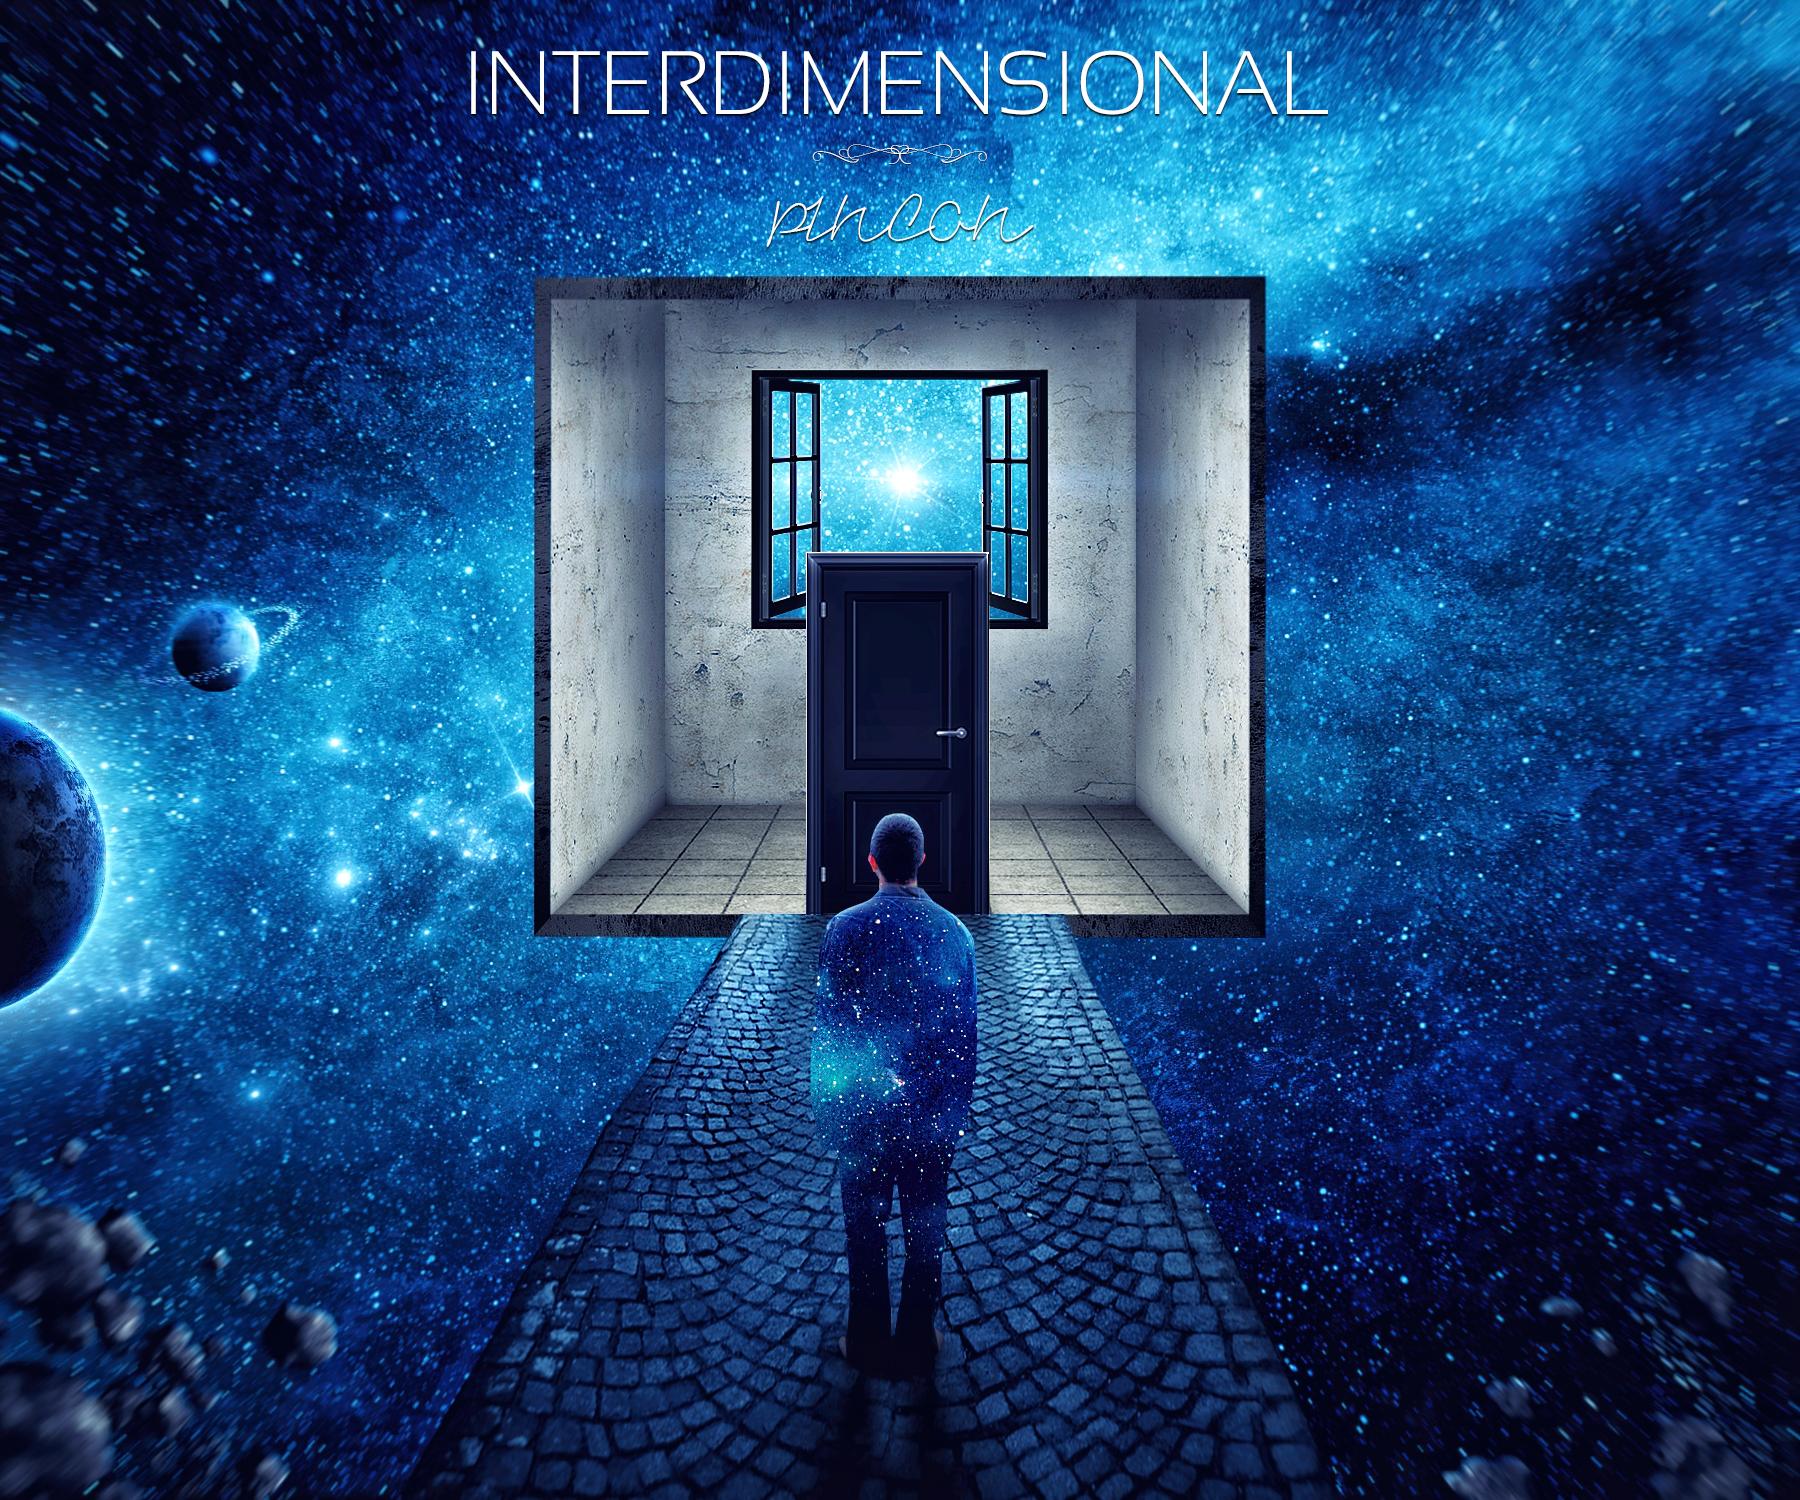 Interdimensional by Pincons on DeviantArt  Interdimensiona...